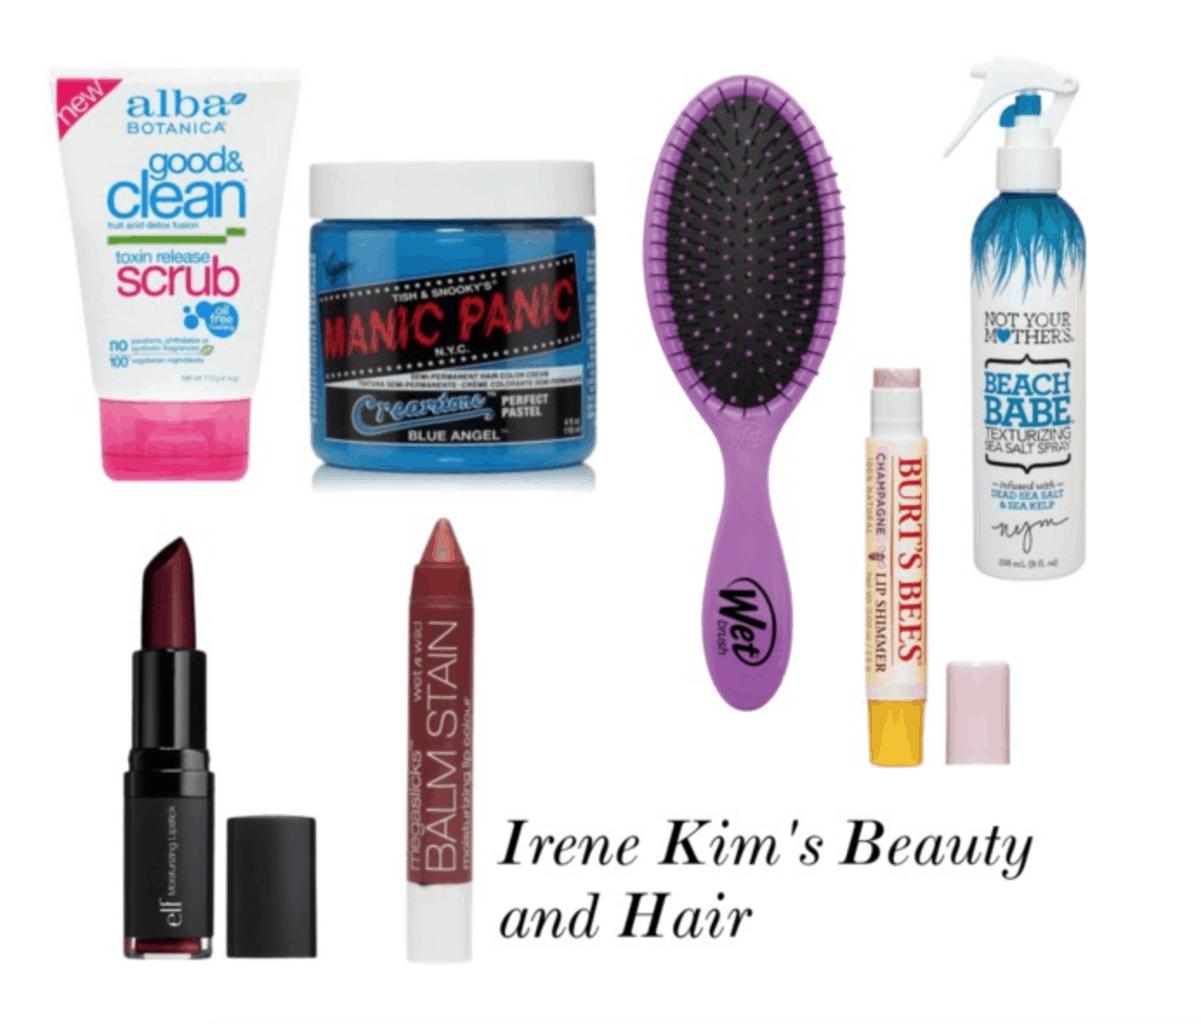 Irene Kim's Beauty essentials